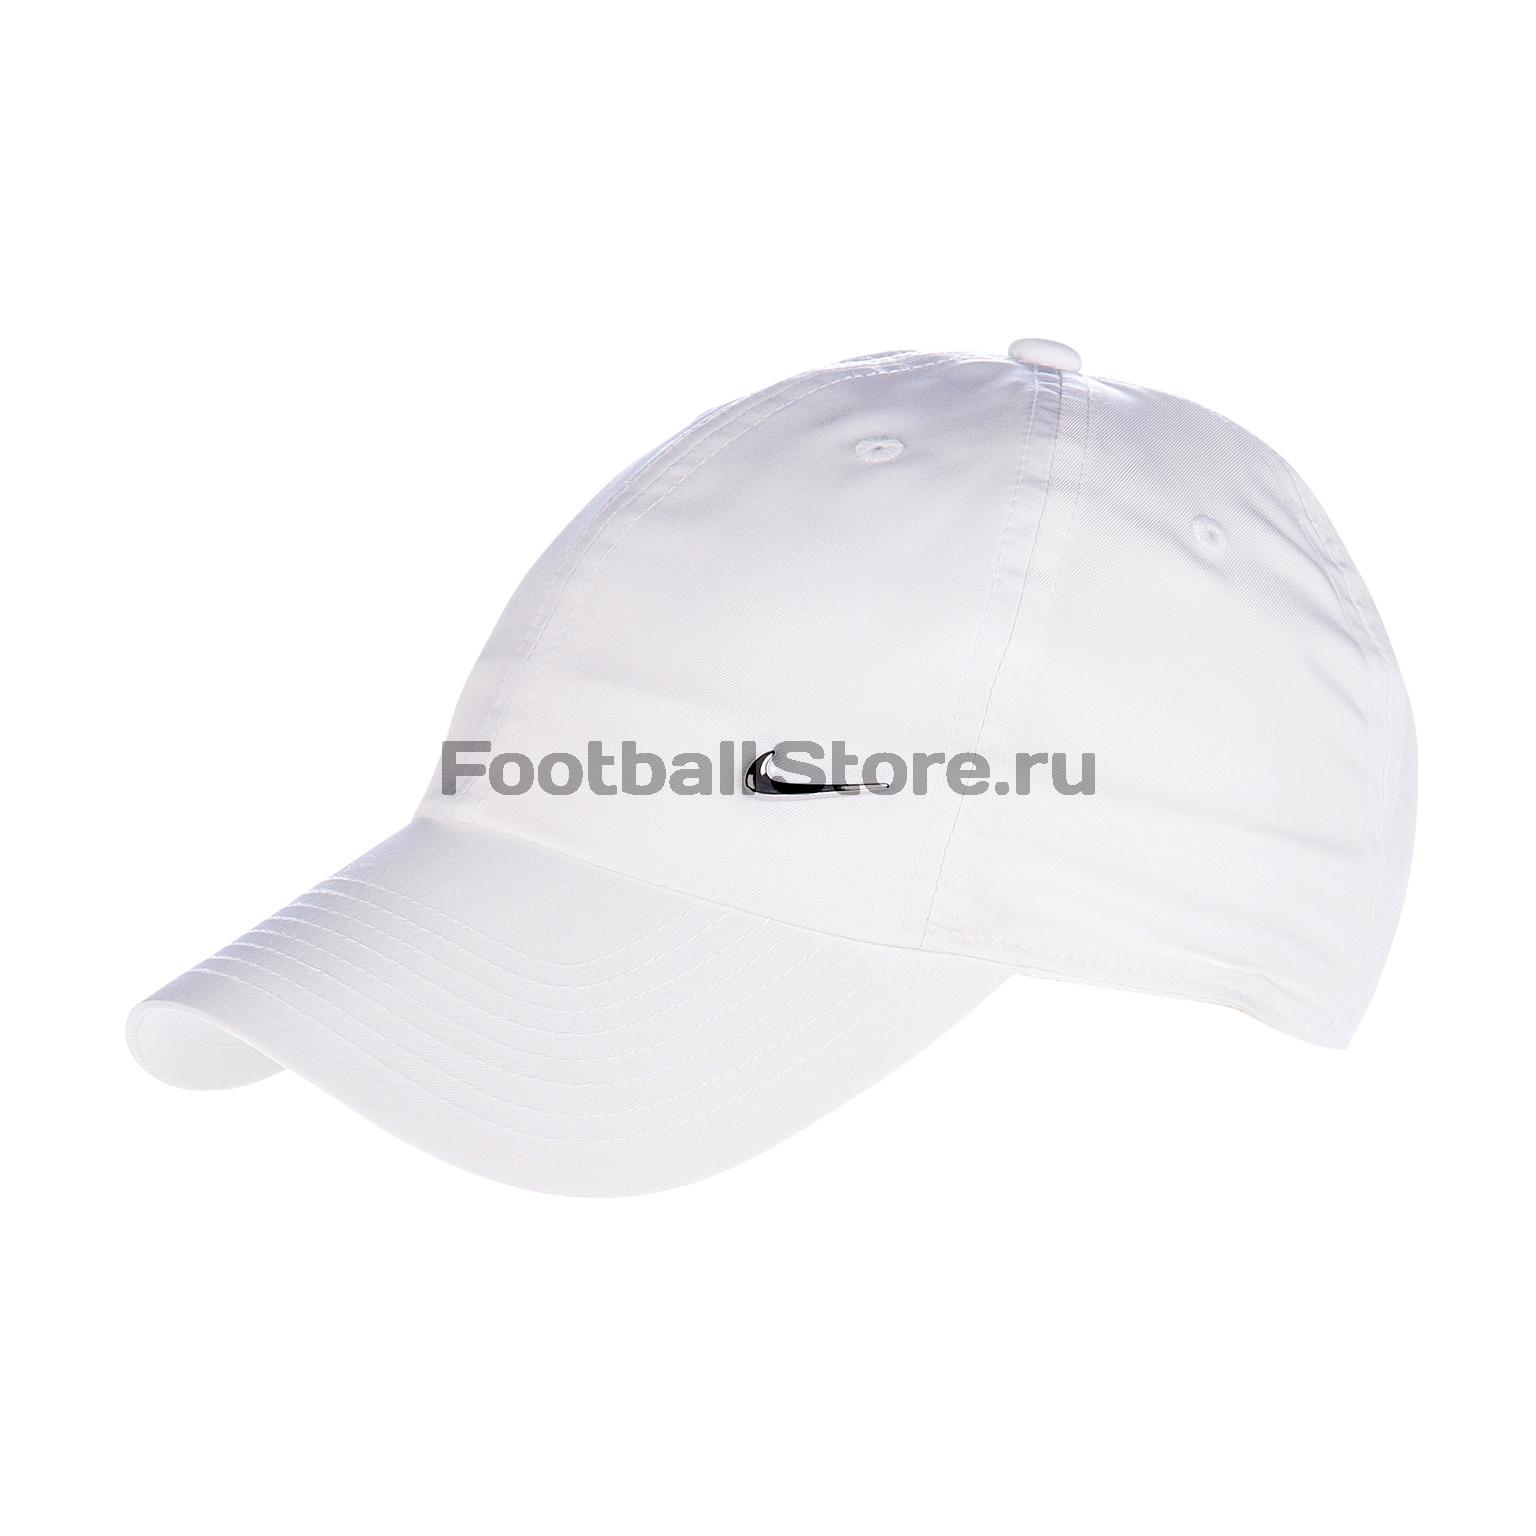 Бейсболка Nike Cap Metal Swoosh 943092-100